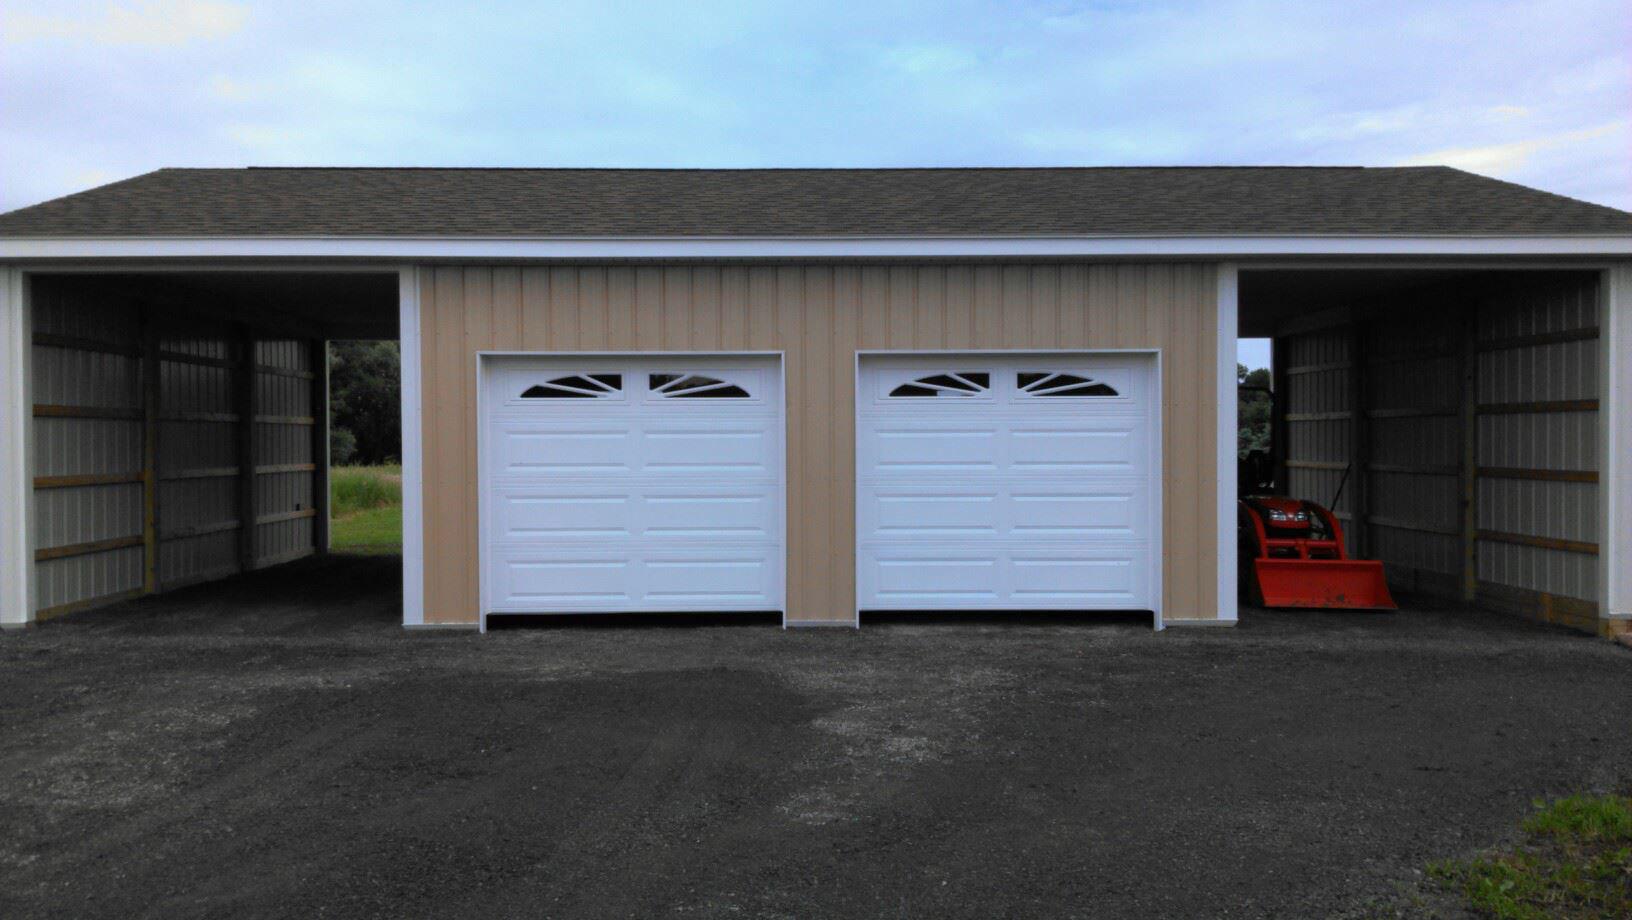 Charmant 8x7 CHI Overhead Doors W Sunburst Decorative Inserts Gasport NY